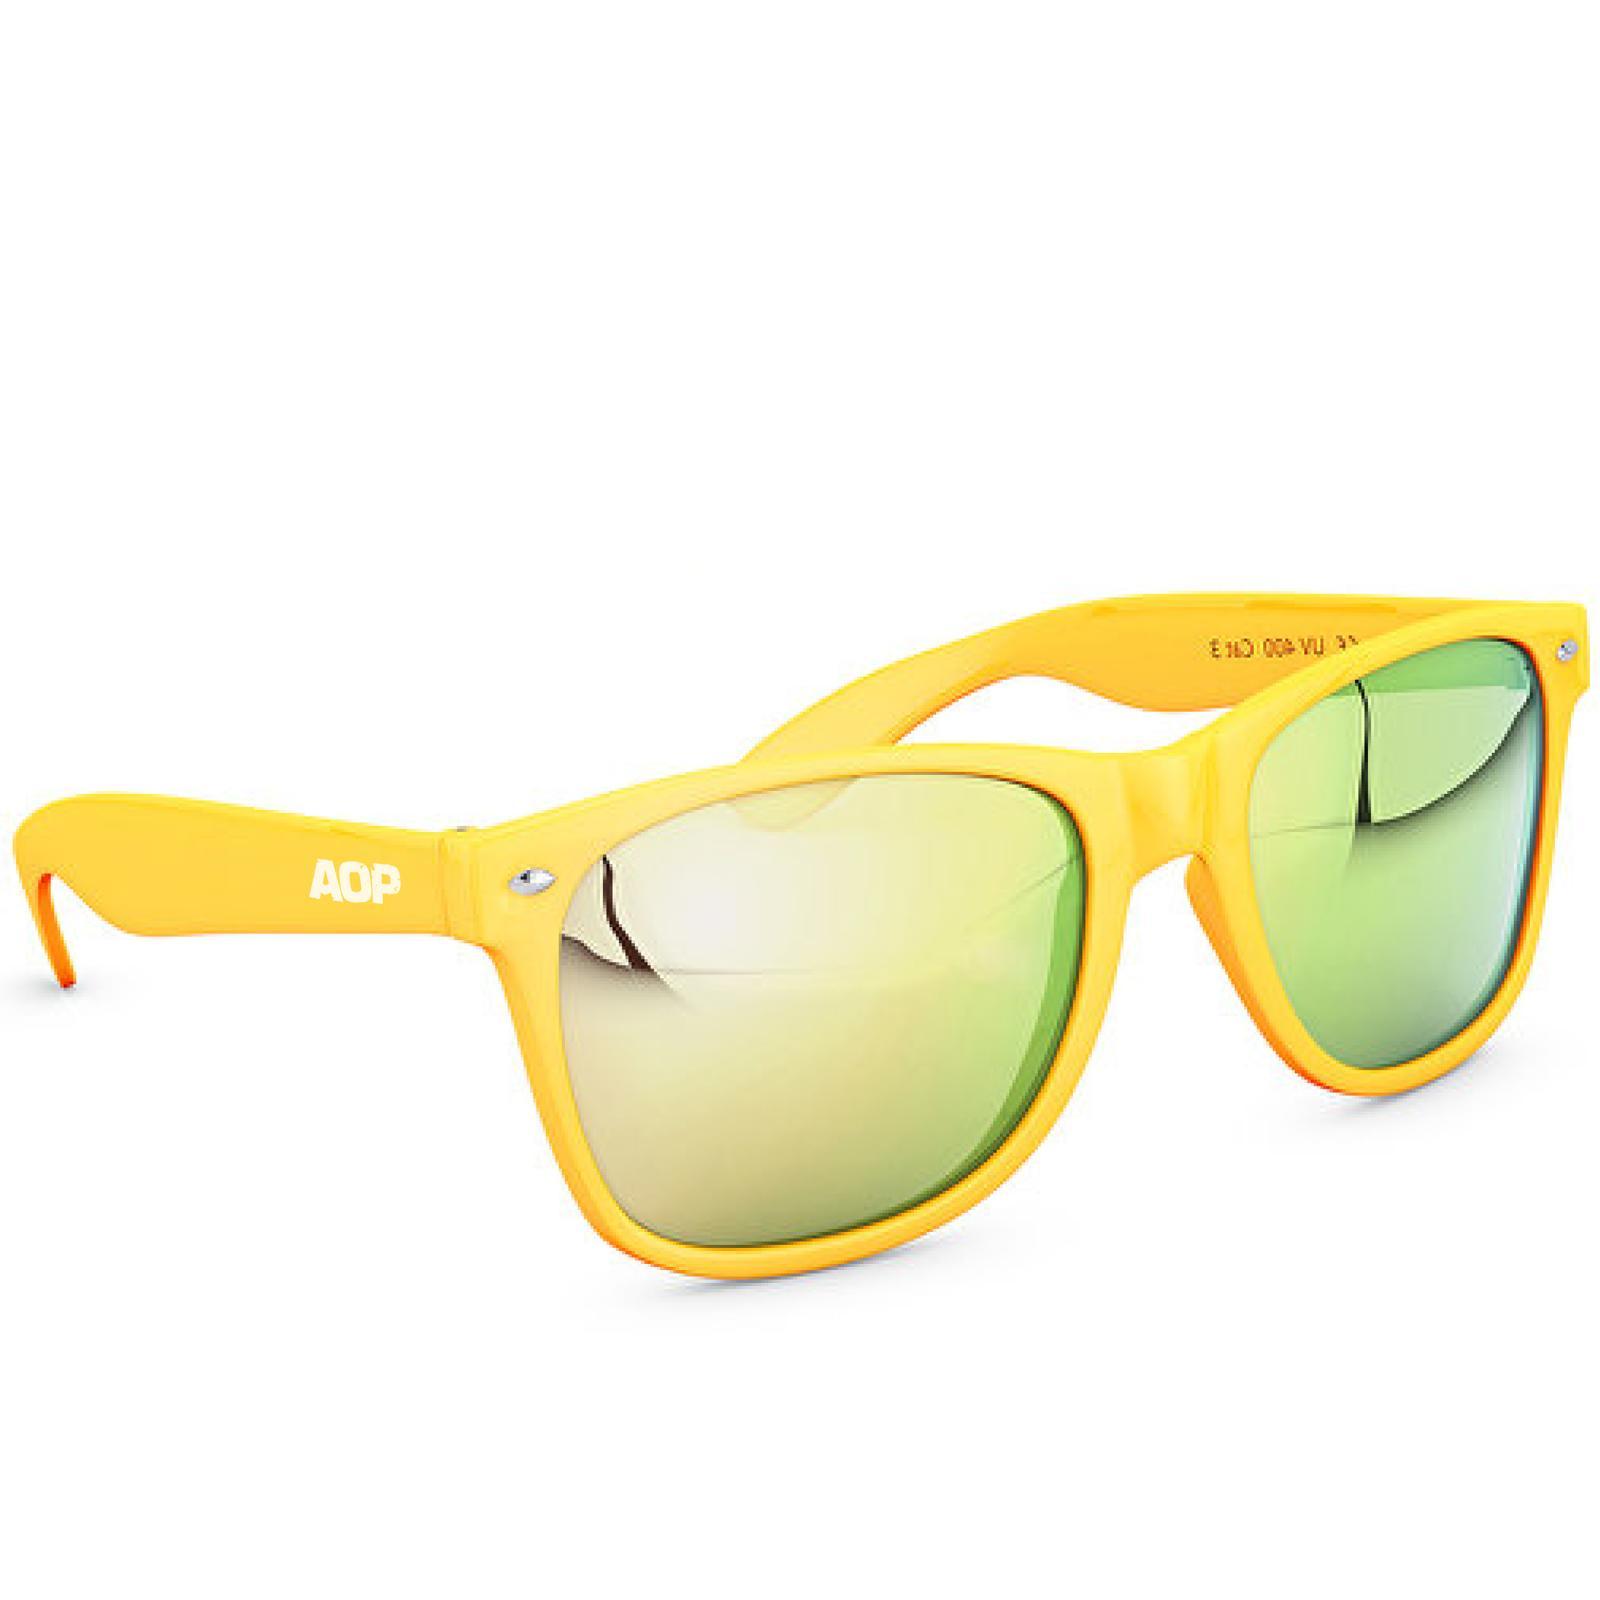 AOP – Sonnenbrille AOP Logo – gelb